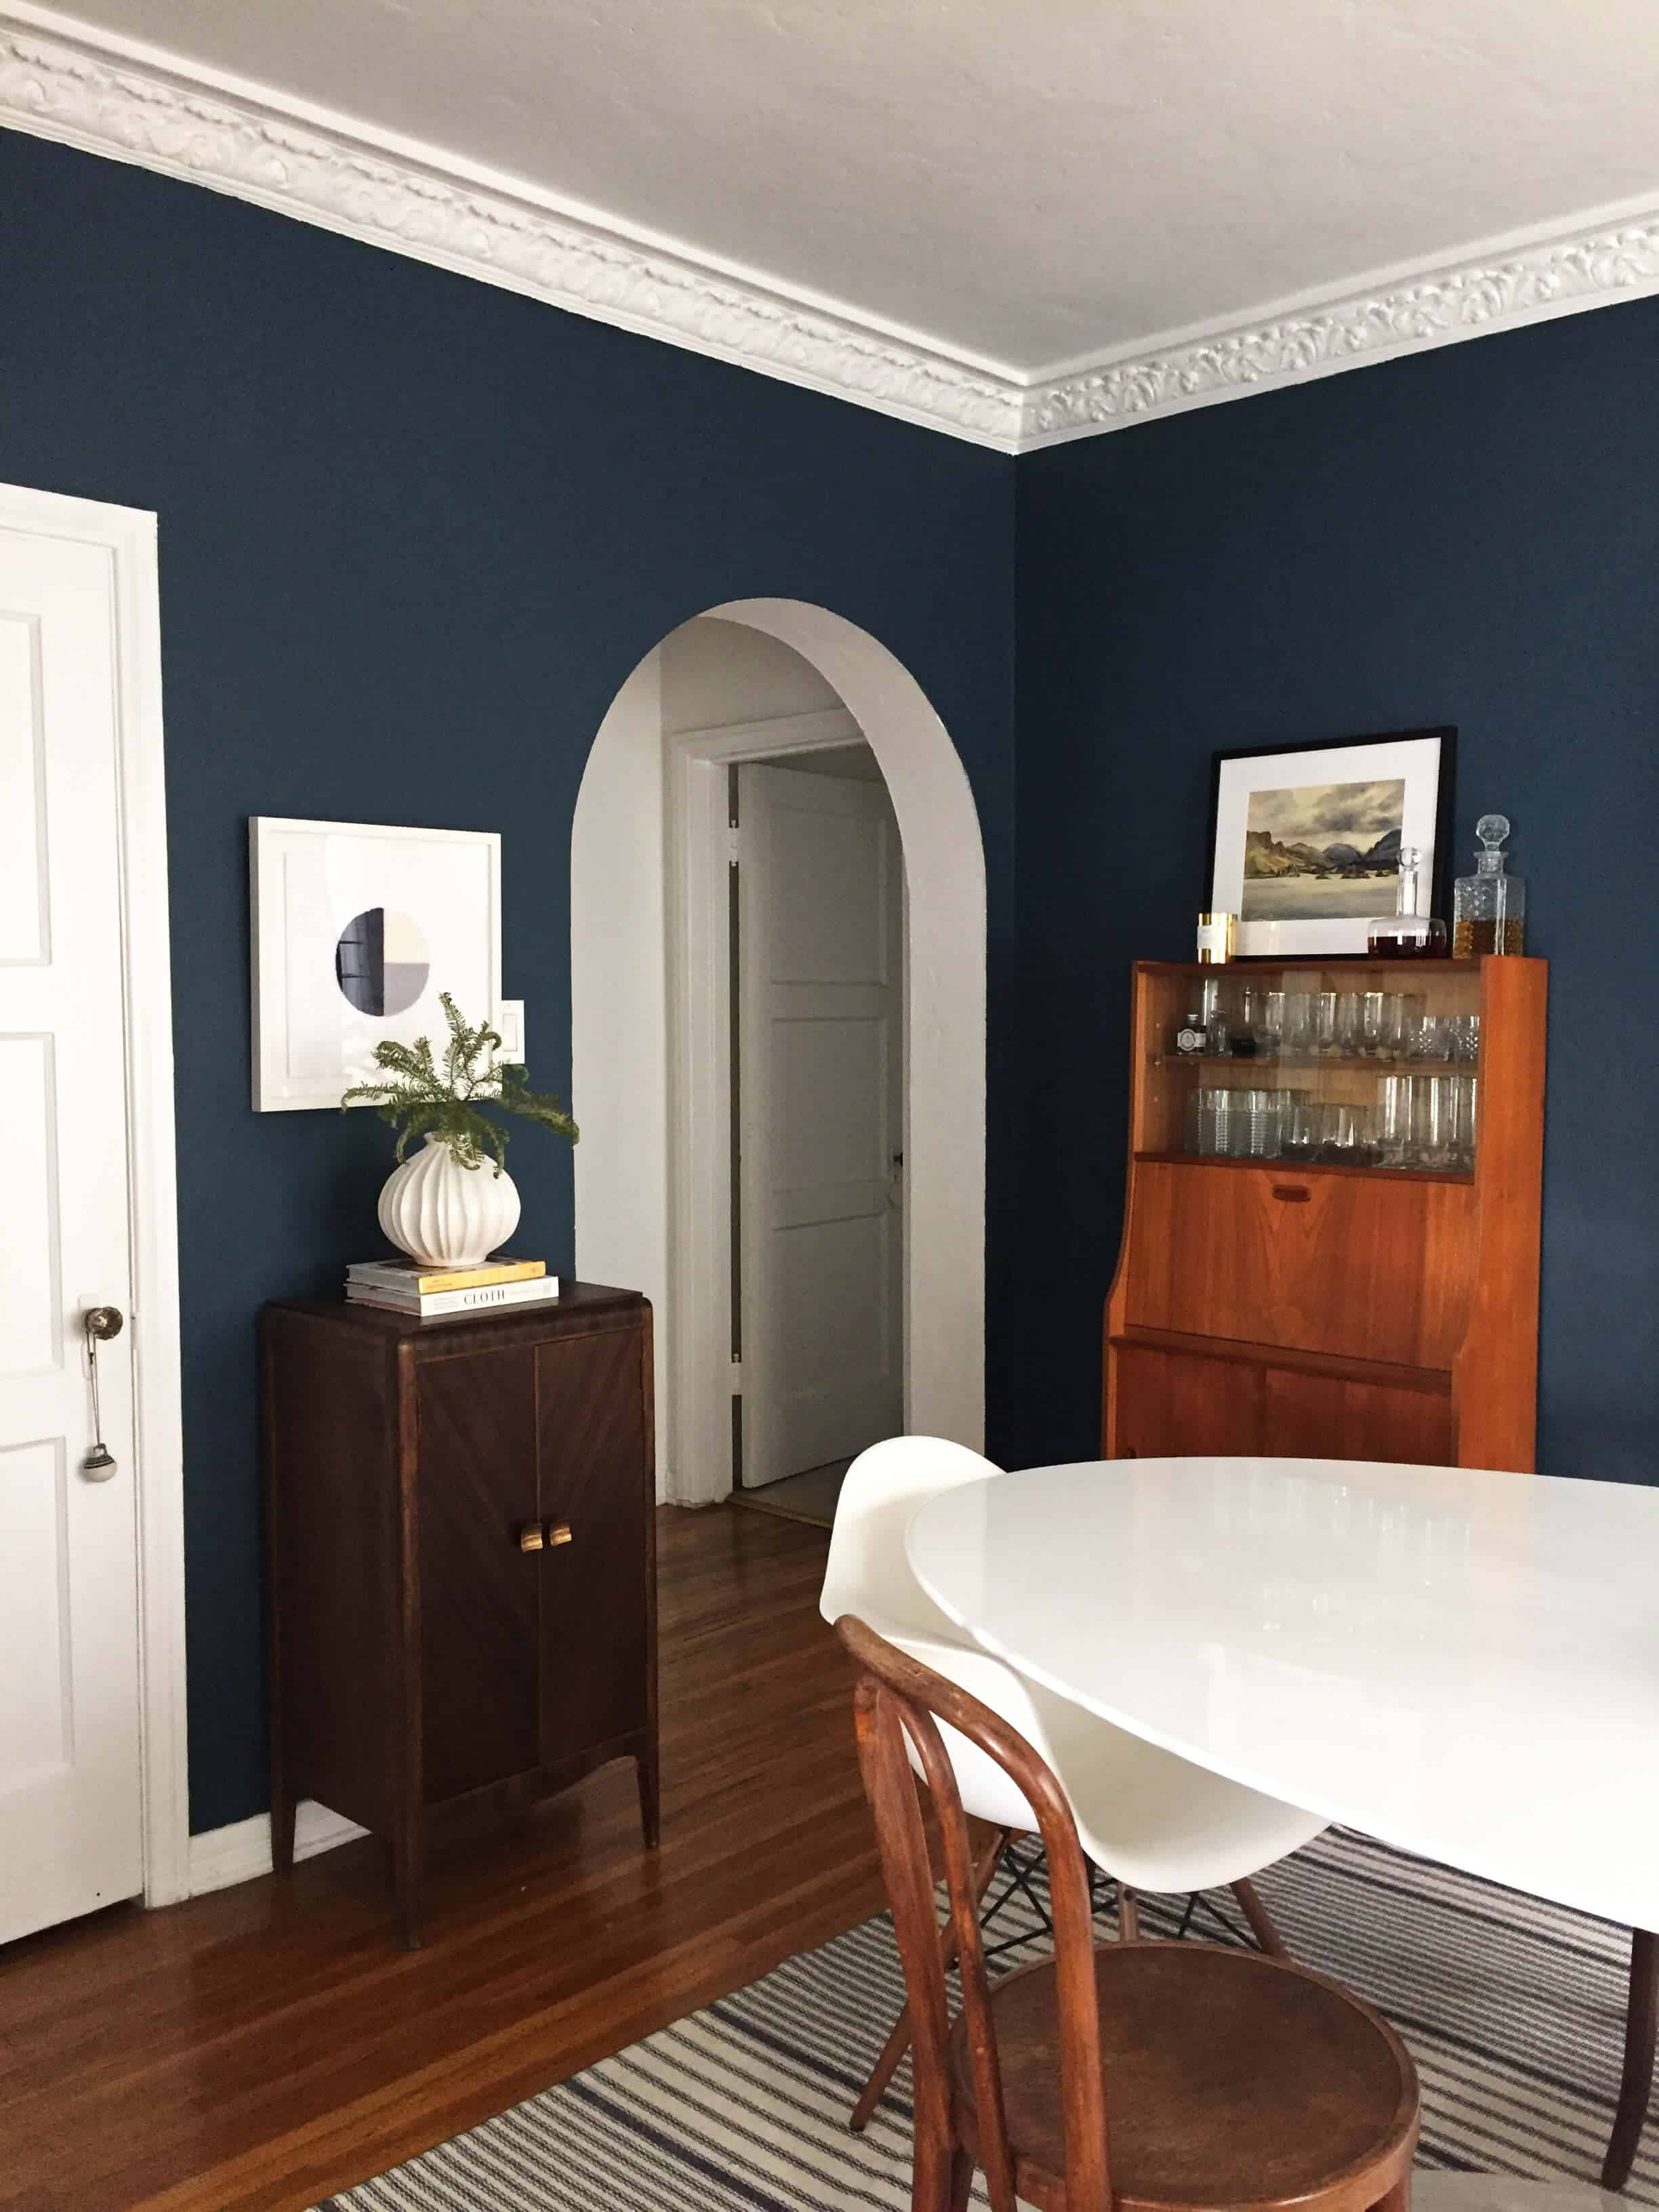 ginny_emily-henderson_jane-denton_art_textile_dining-room_1